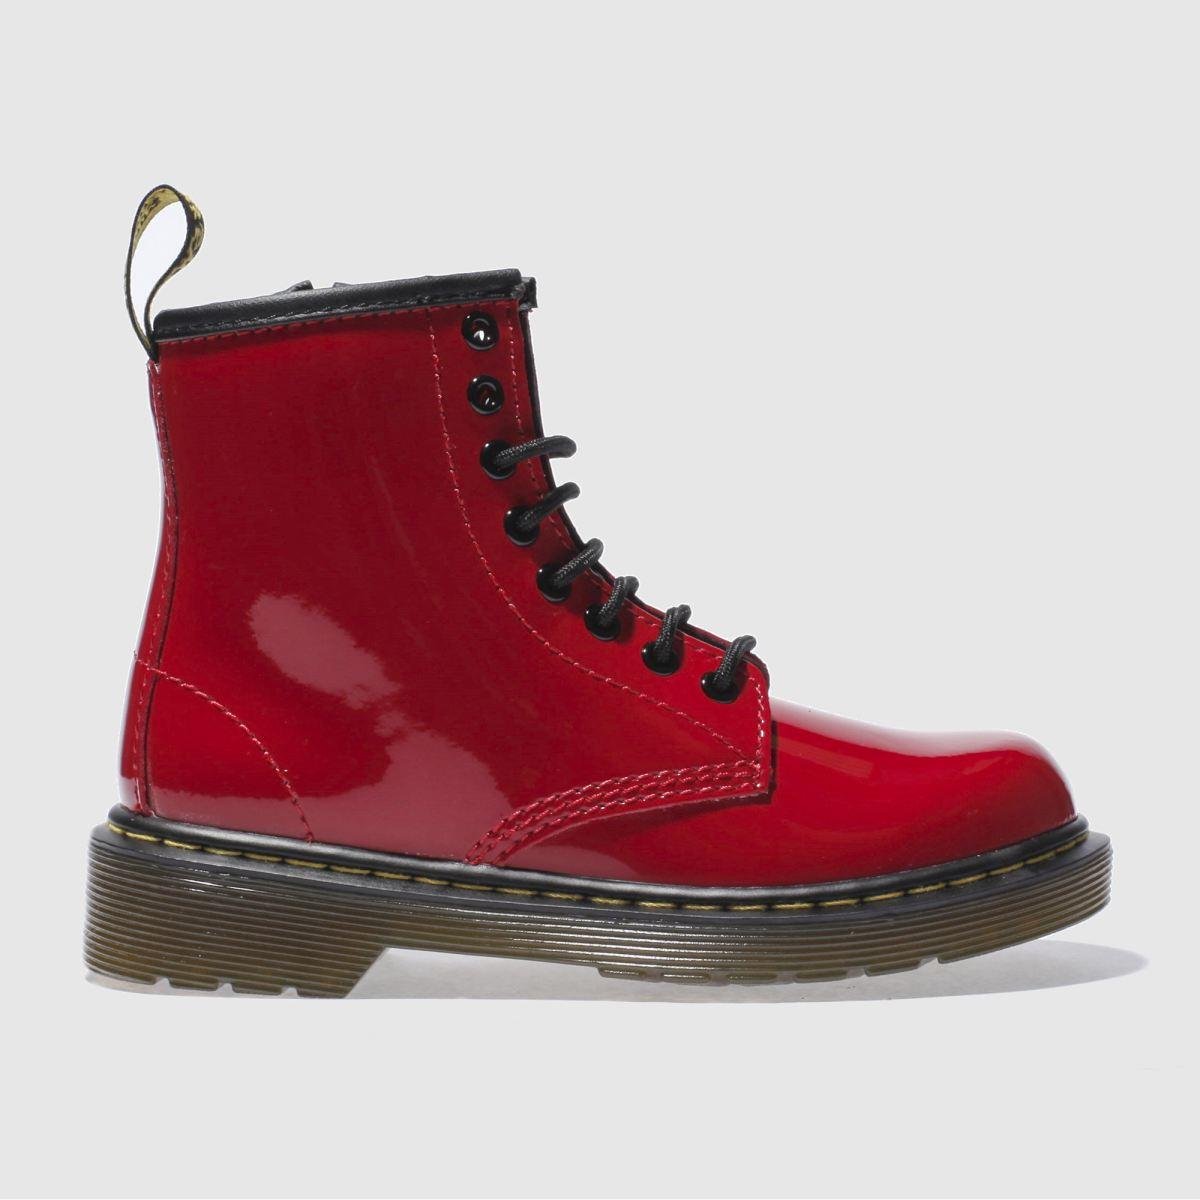 Dr Martens Red 1460 Girls Junior Boots